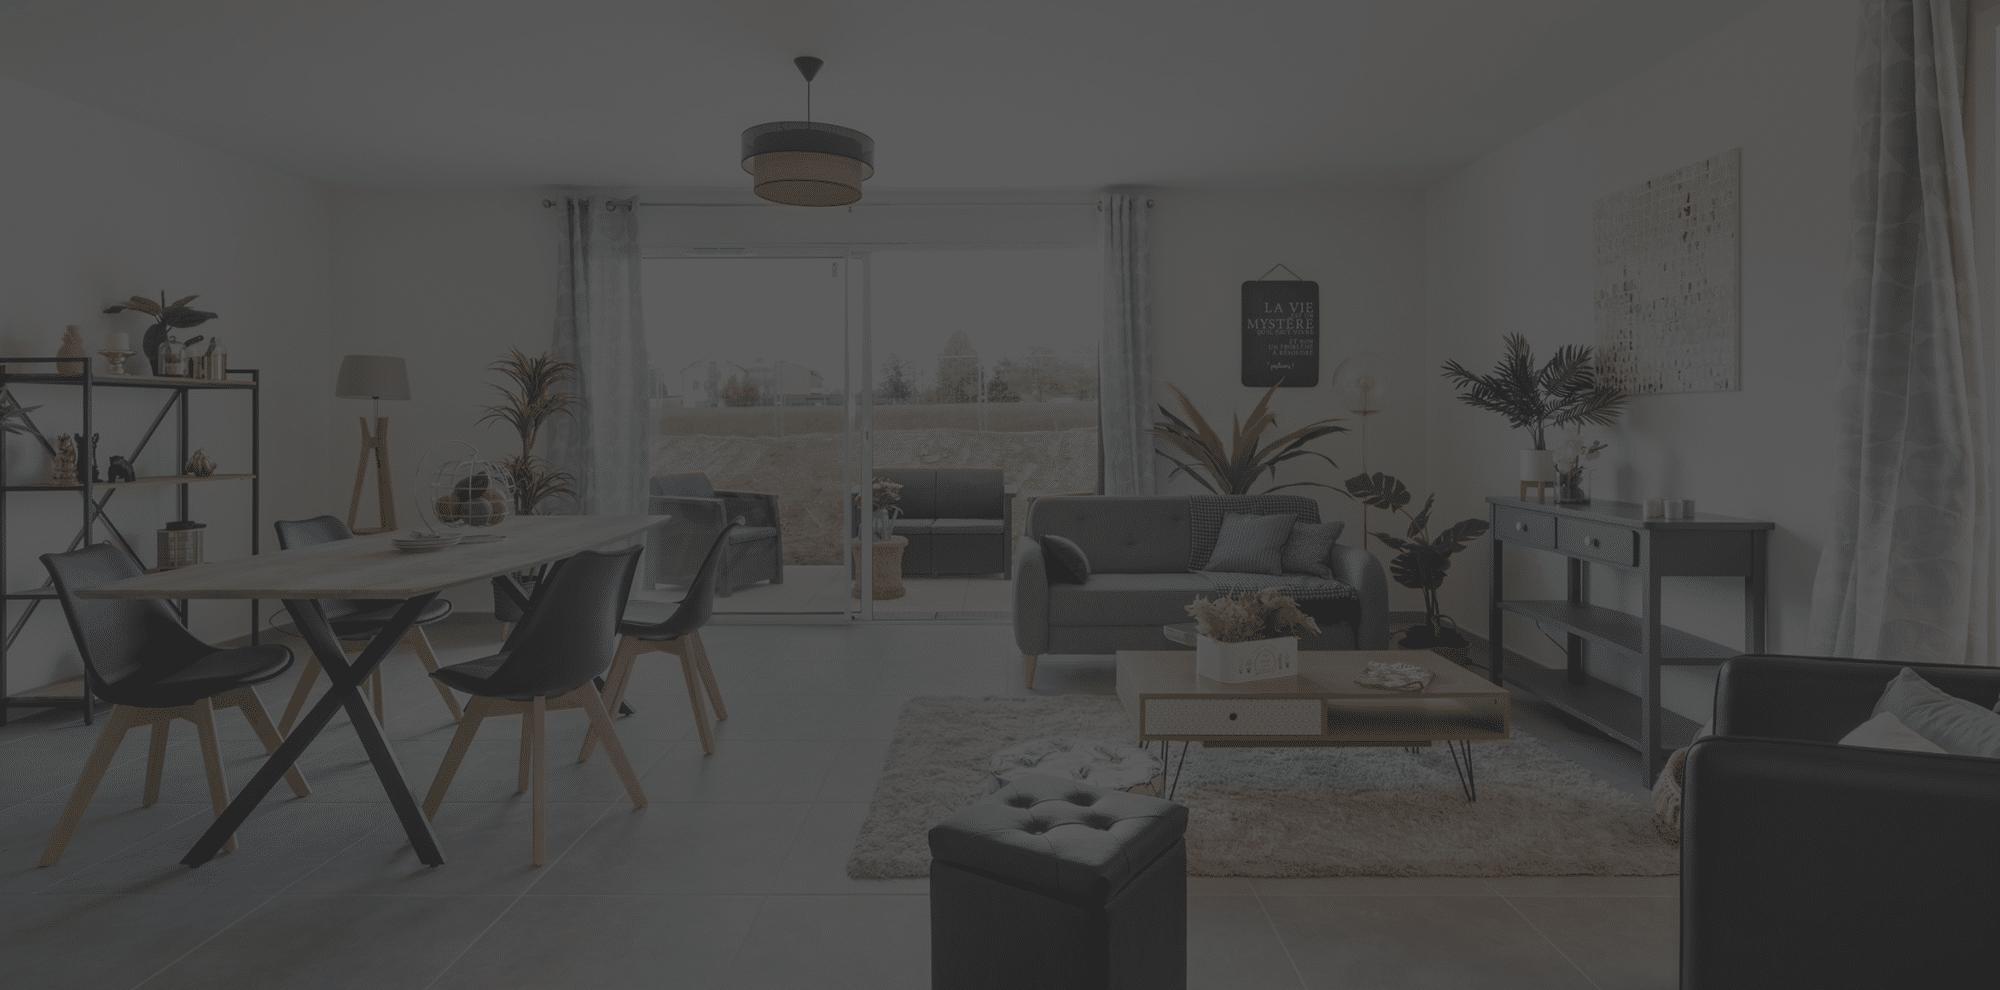 Agence Immobilière Home Staging home staging experts : réseau national de home staging en france